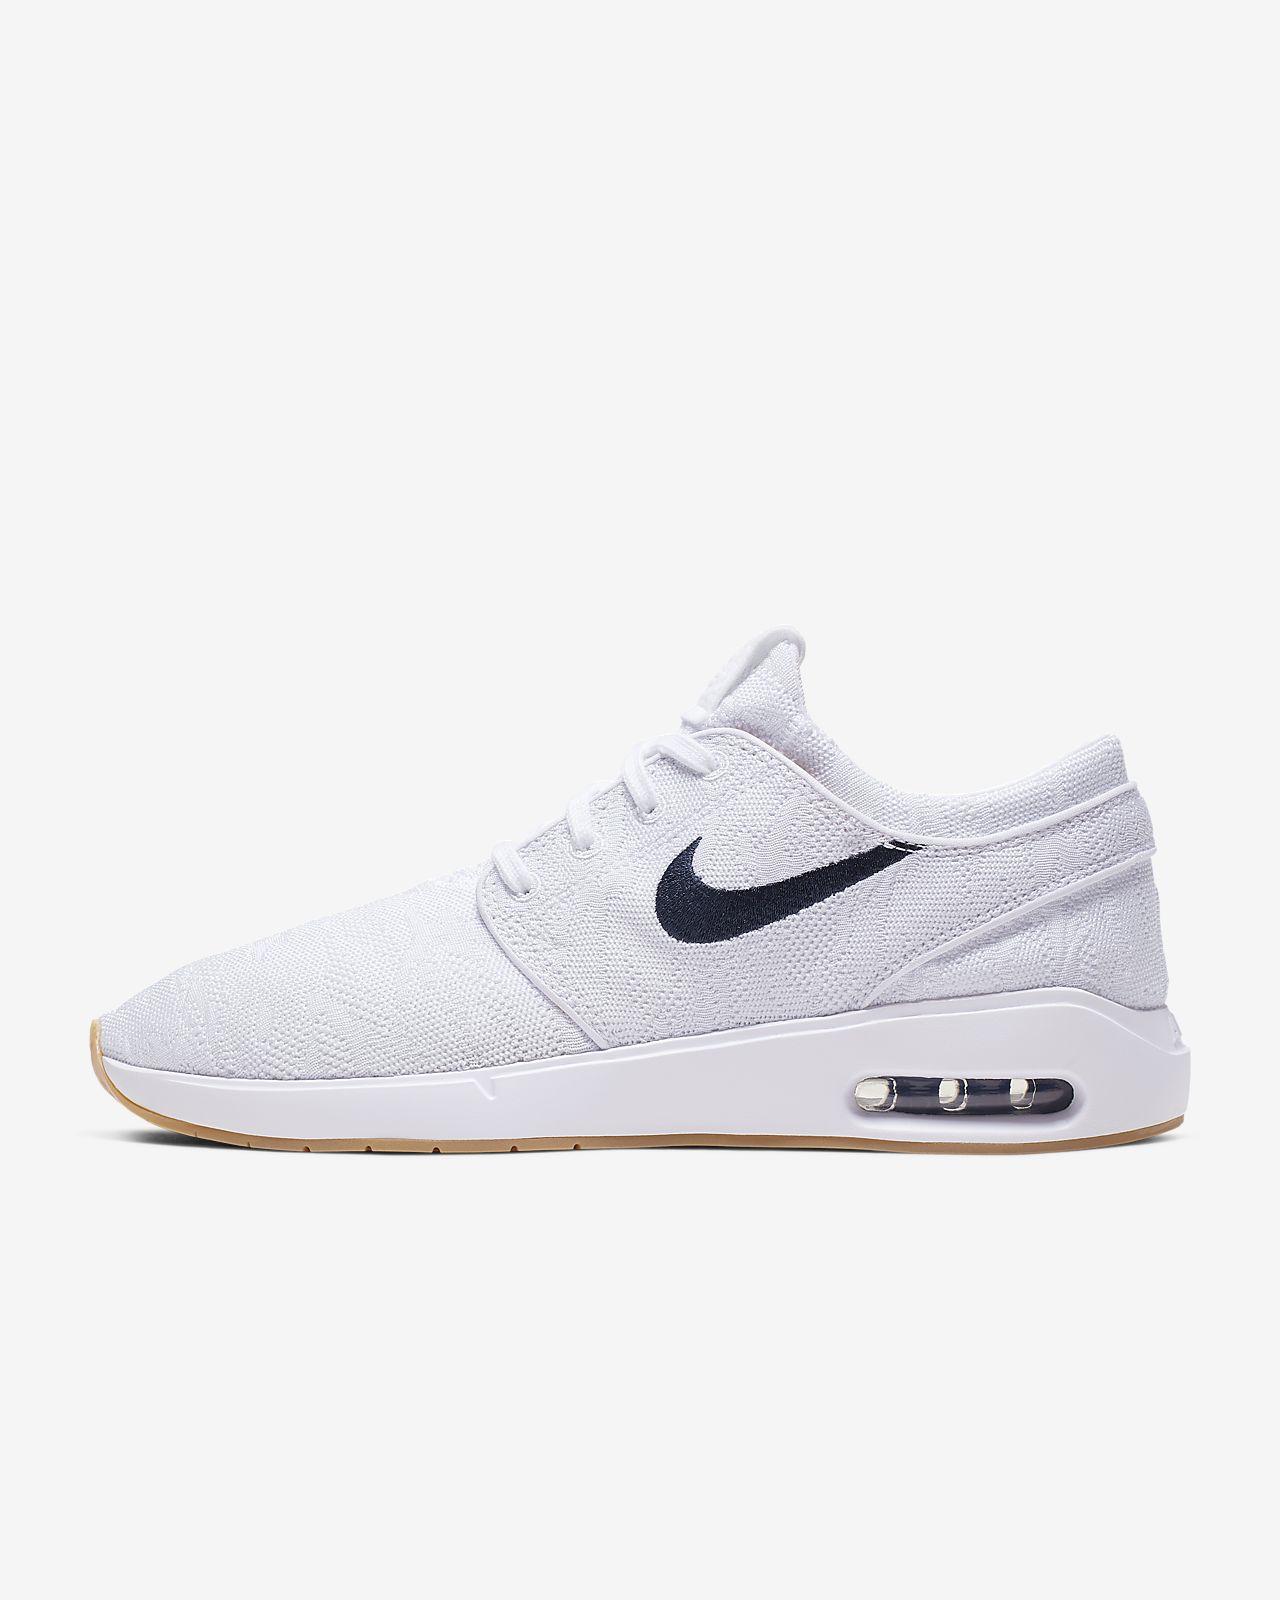 Nike SB Air Max Stefan Janoski 2 Men's Skate Shoe